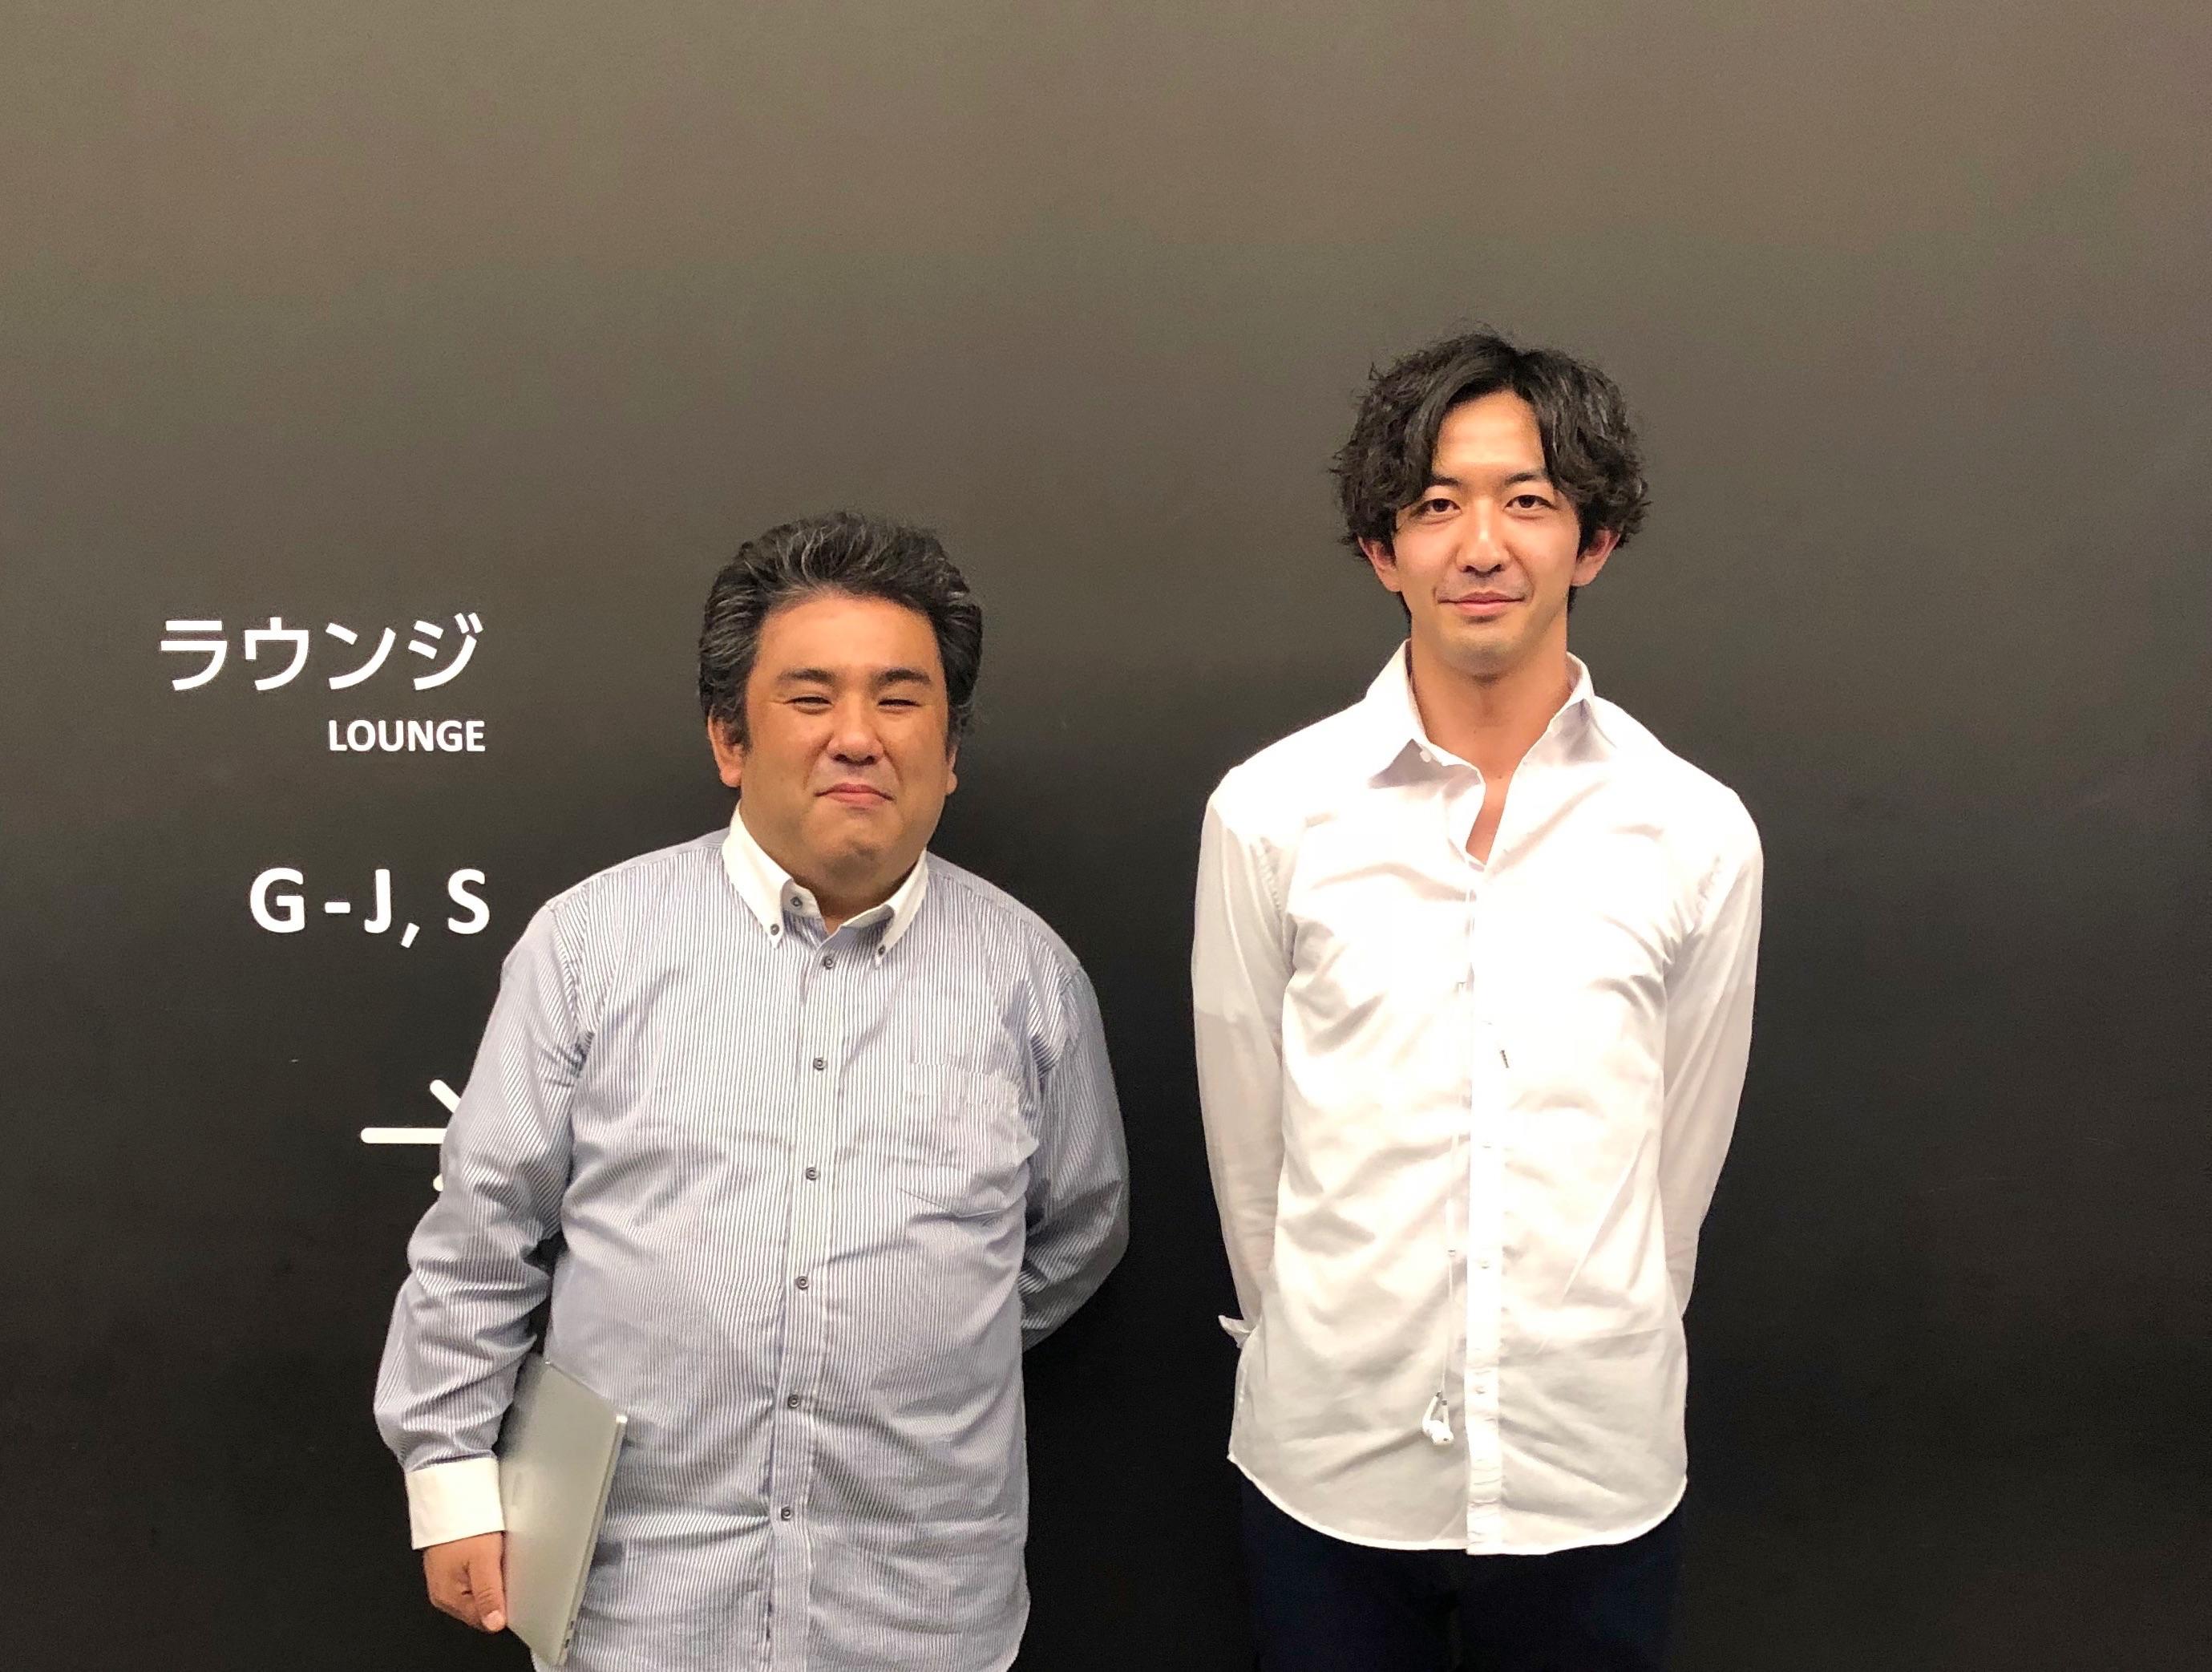 ヤフー株式会社 川村様